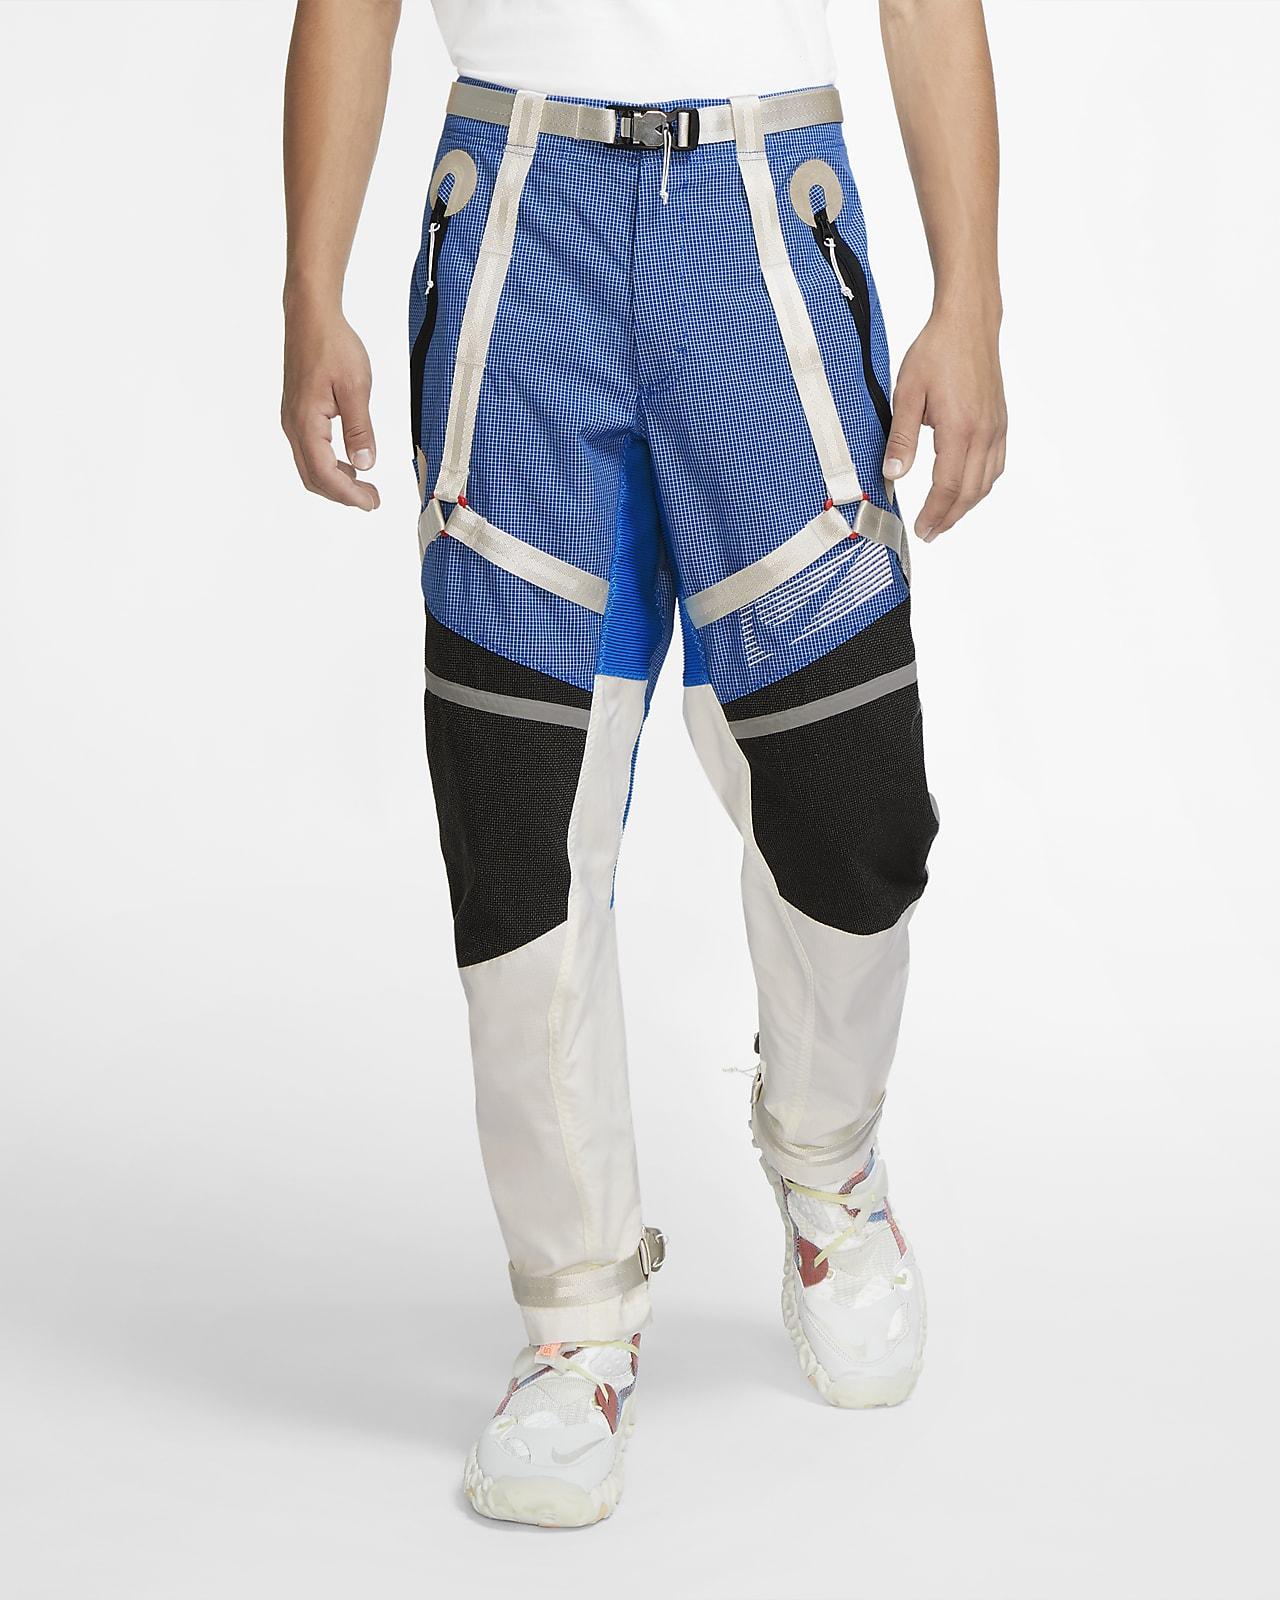 Pantalón Nike ISPA